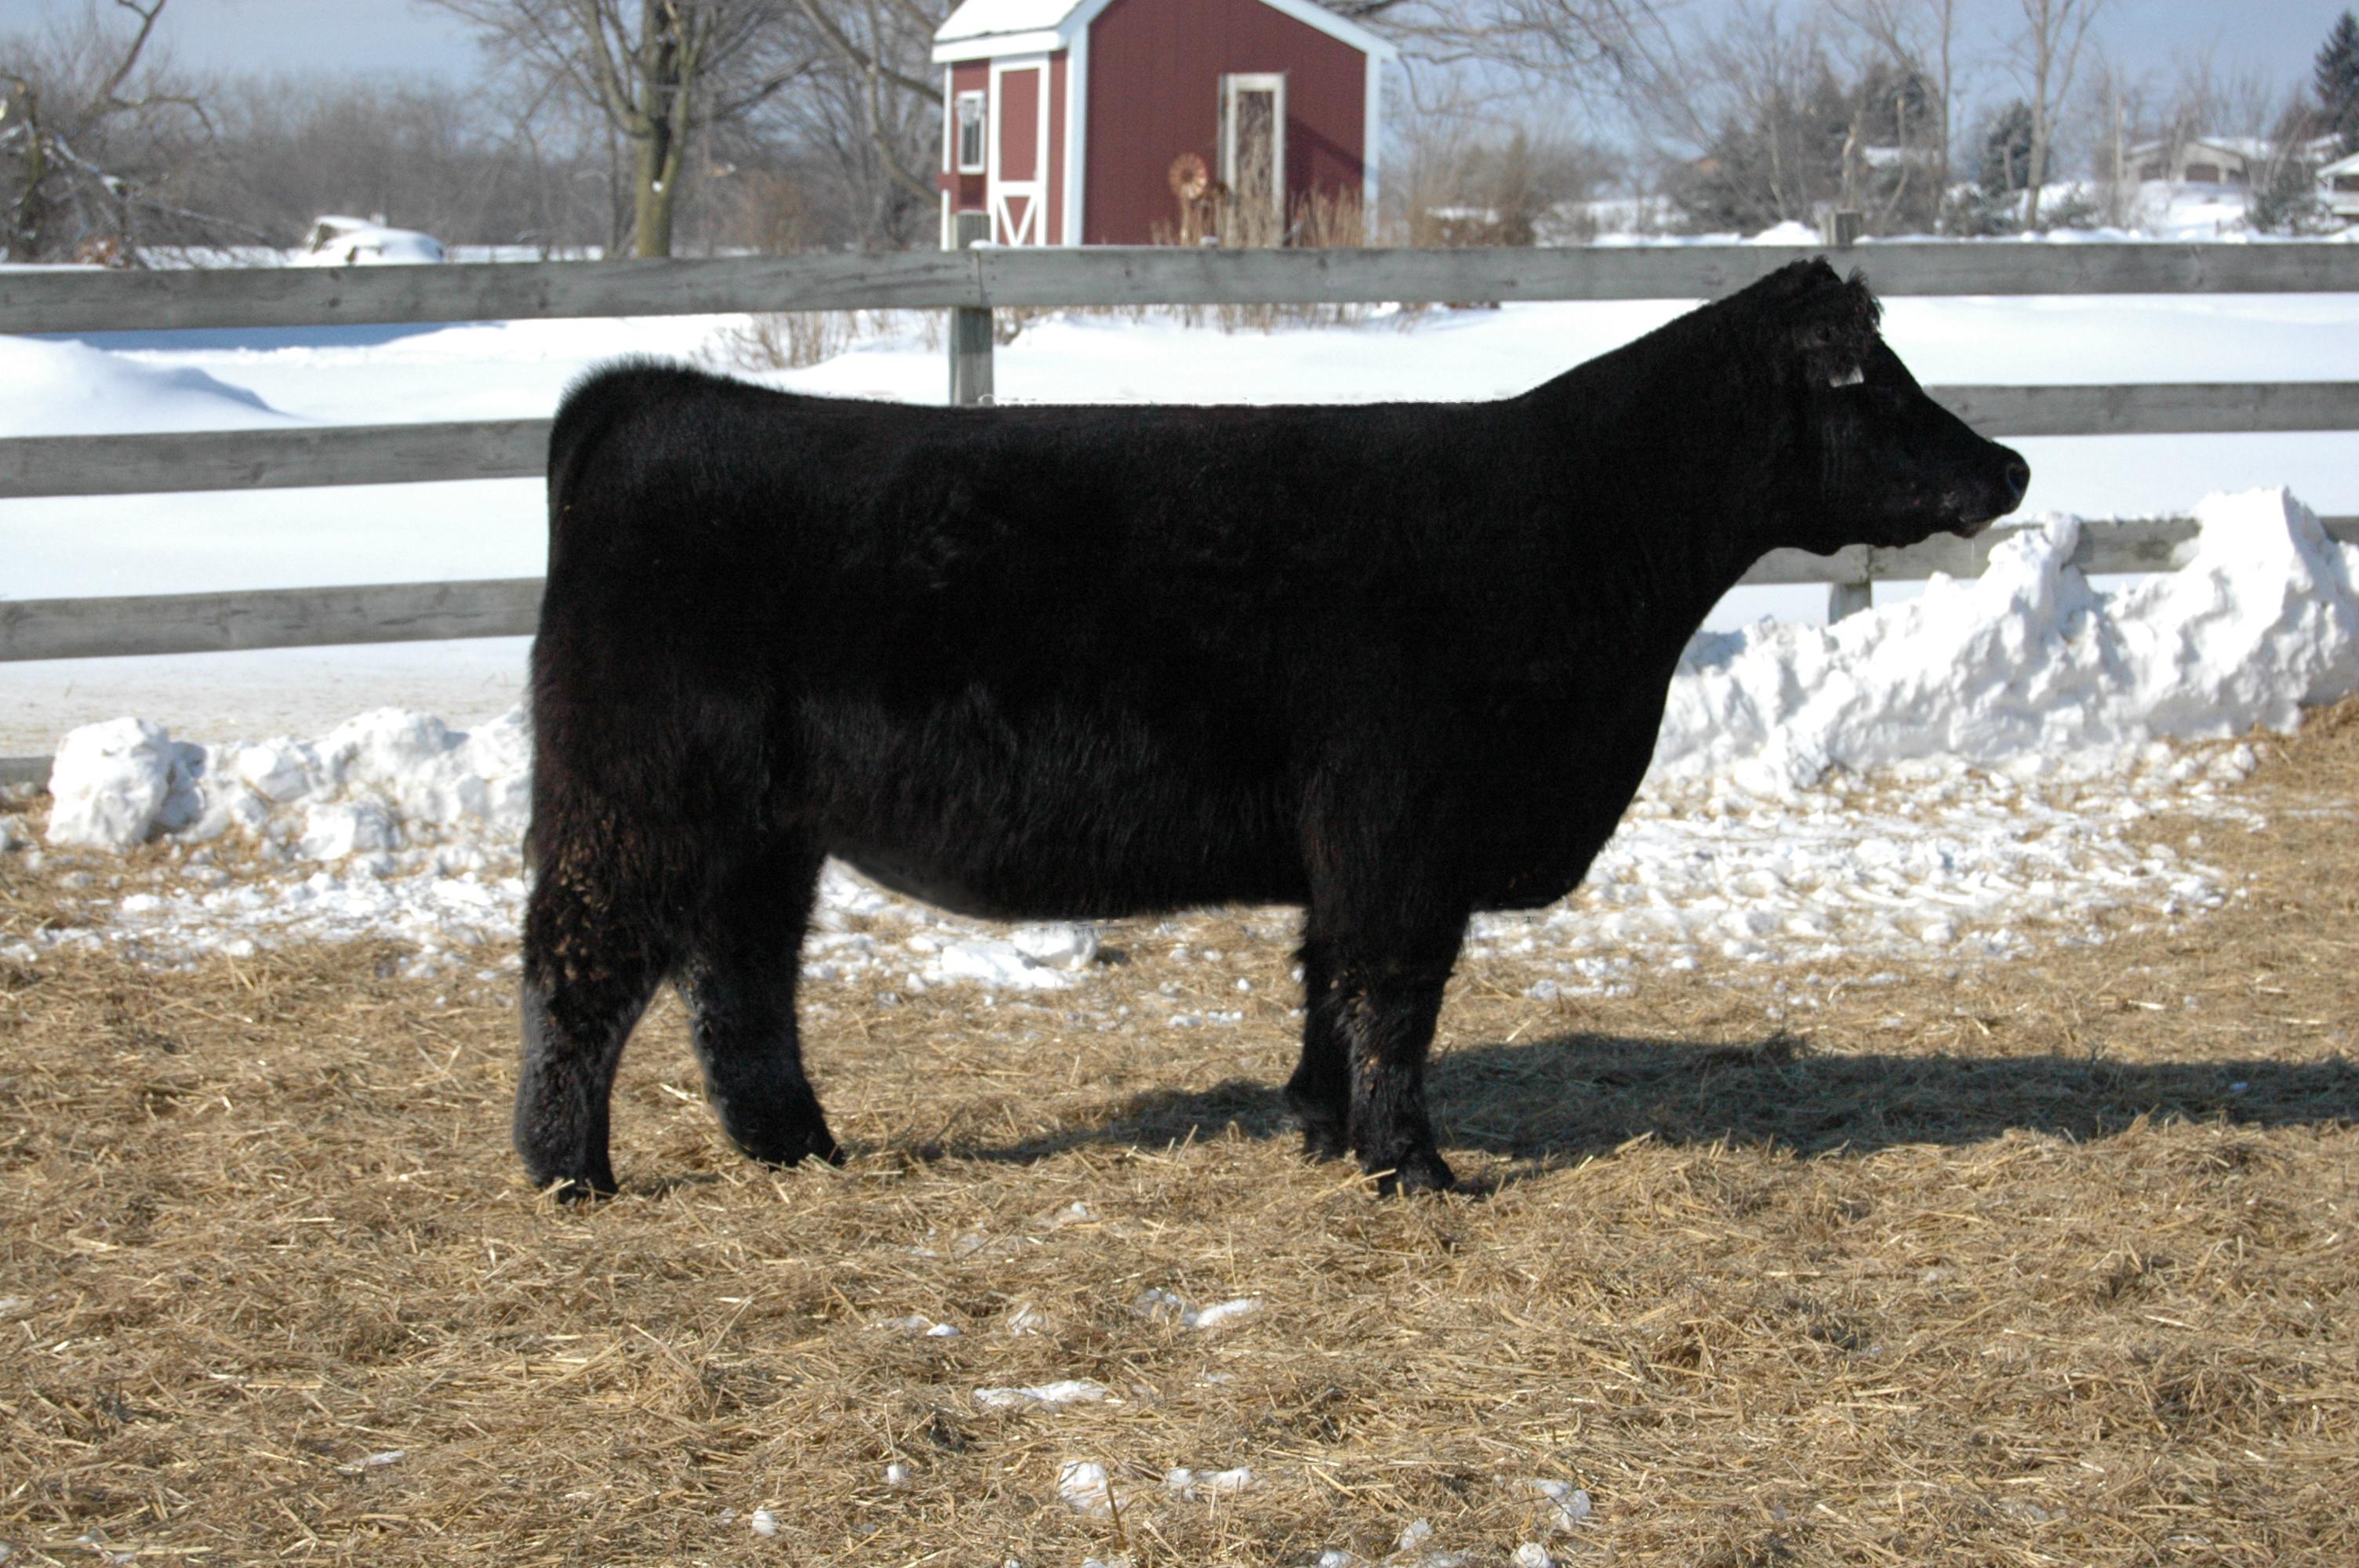 welshans show cattle schneider farms upcoming sales. Black Bedroom Furniture Sets. Home Design Ideas